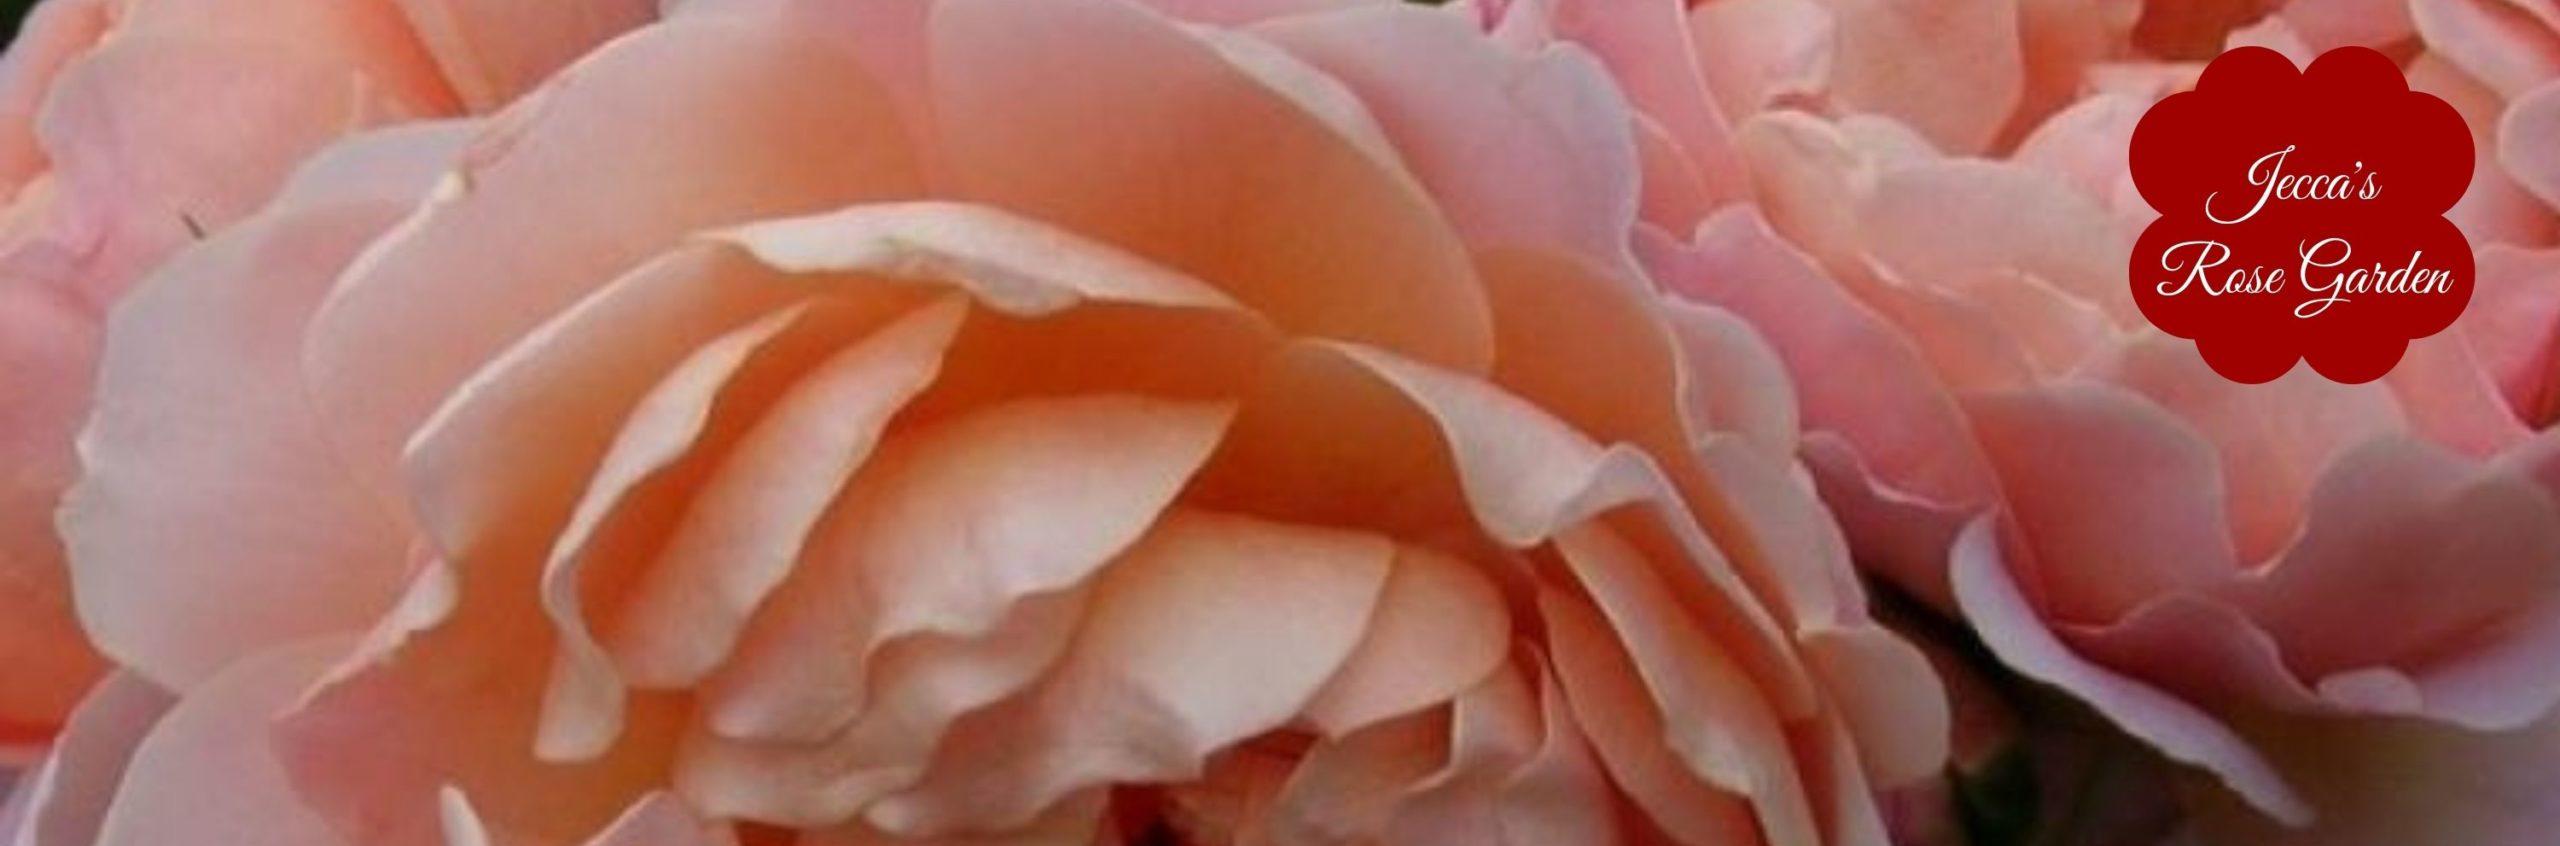 Jecca's Rose Garden